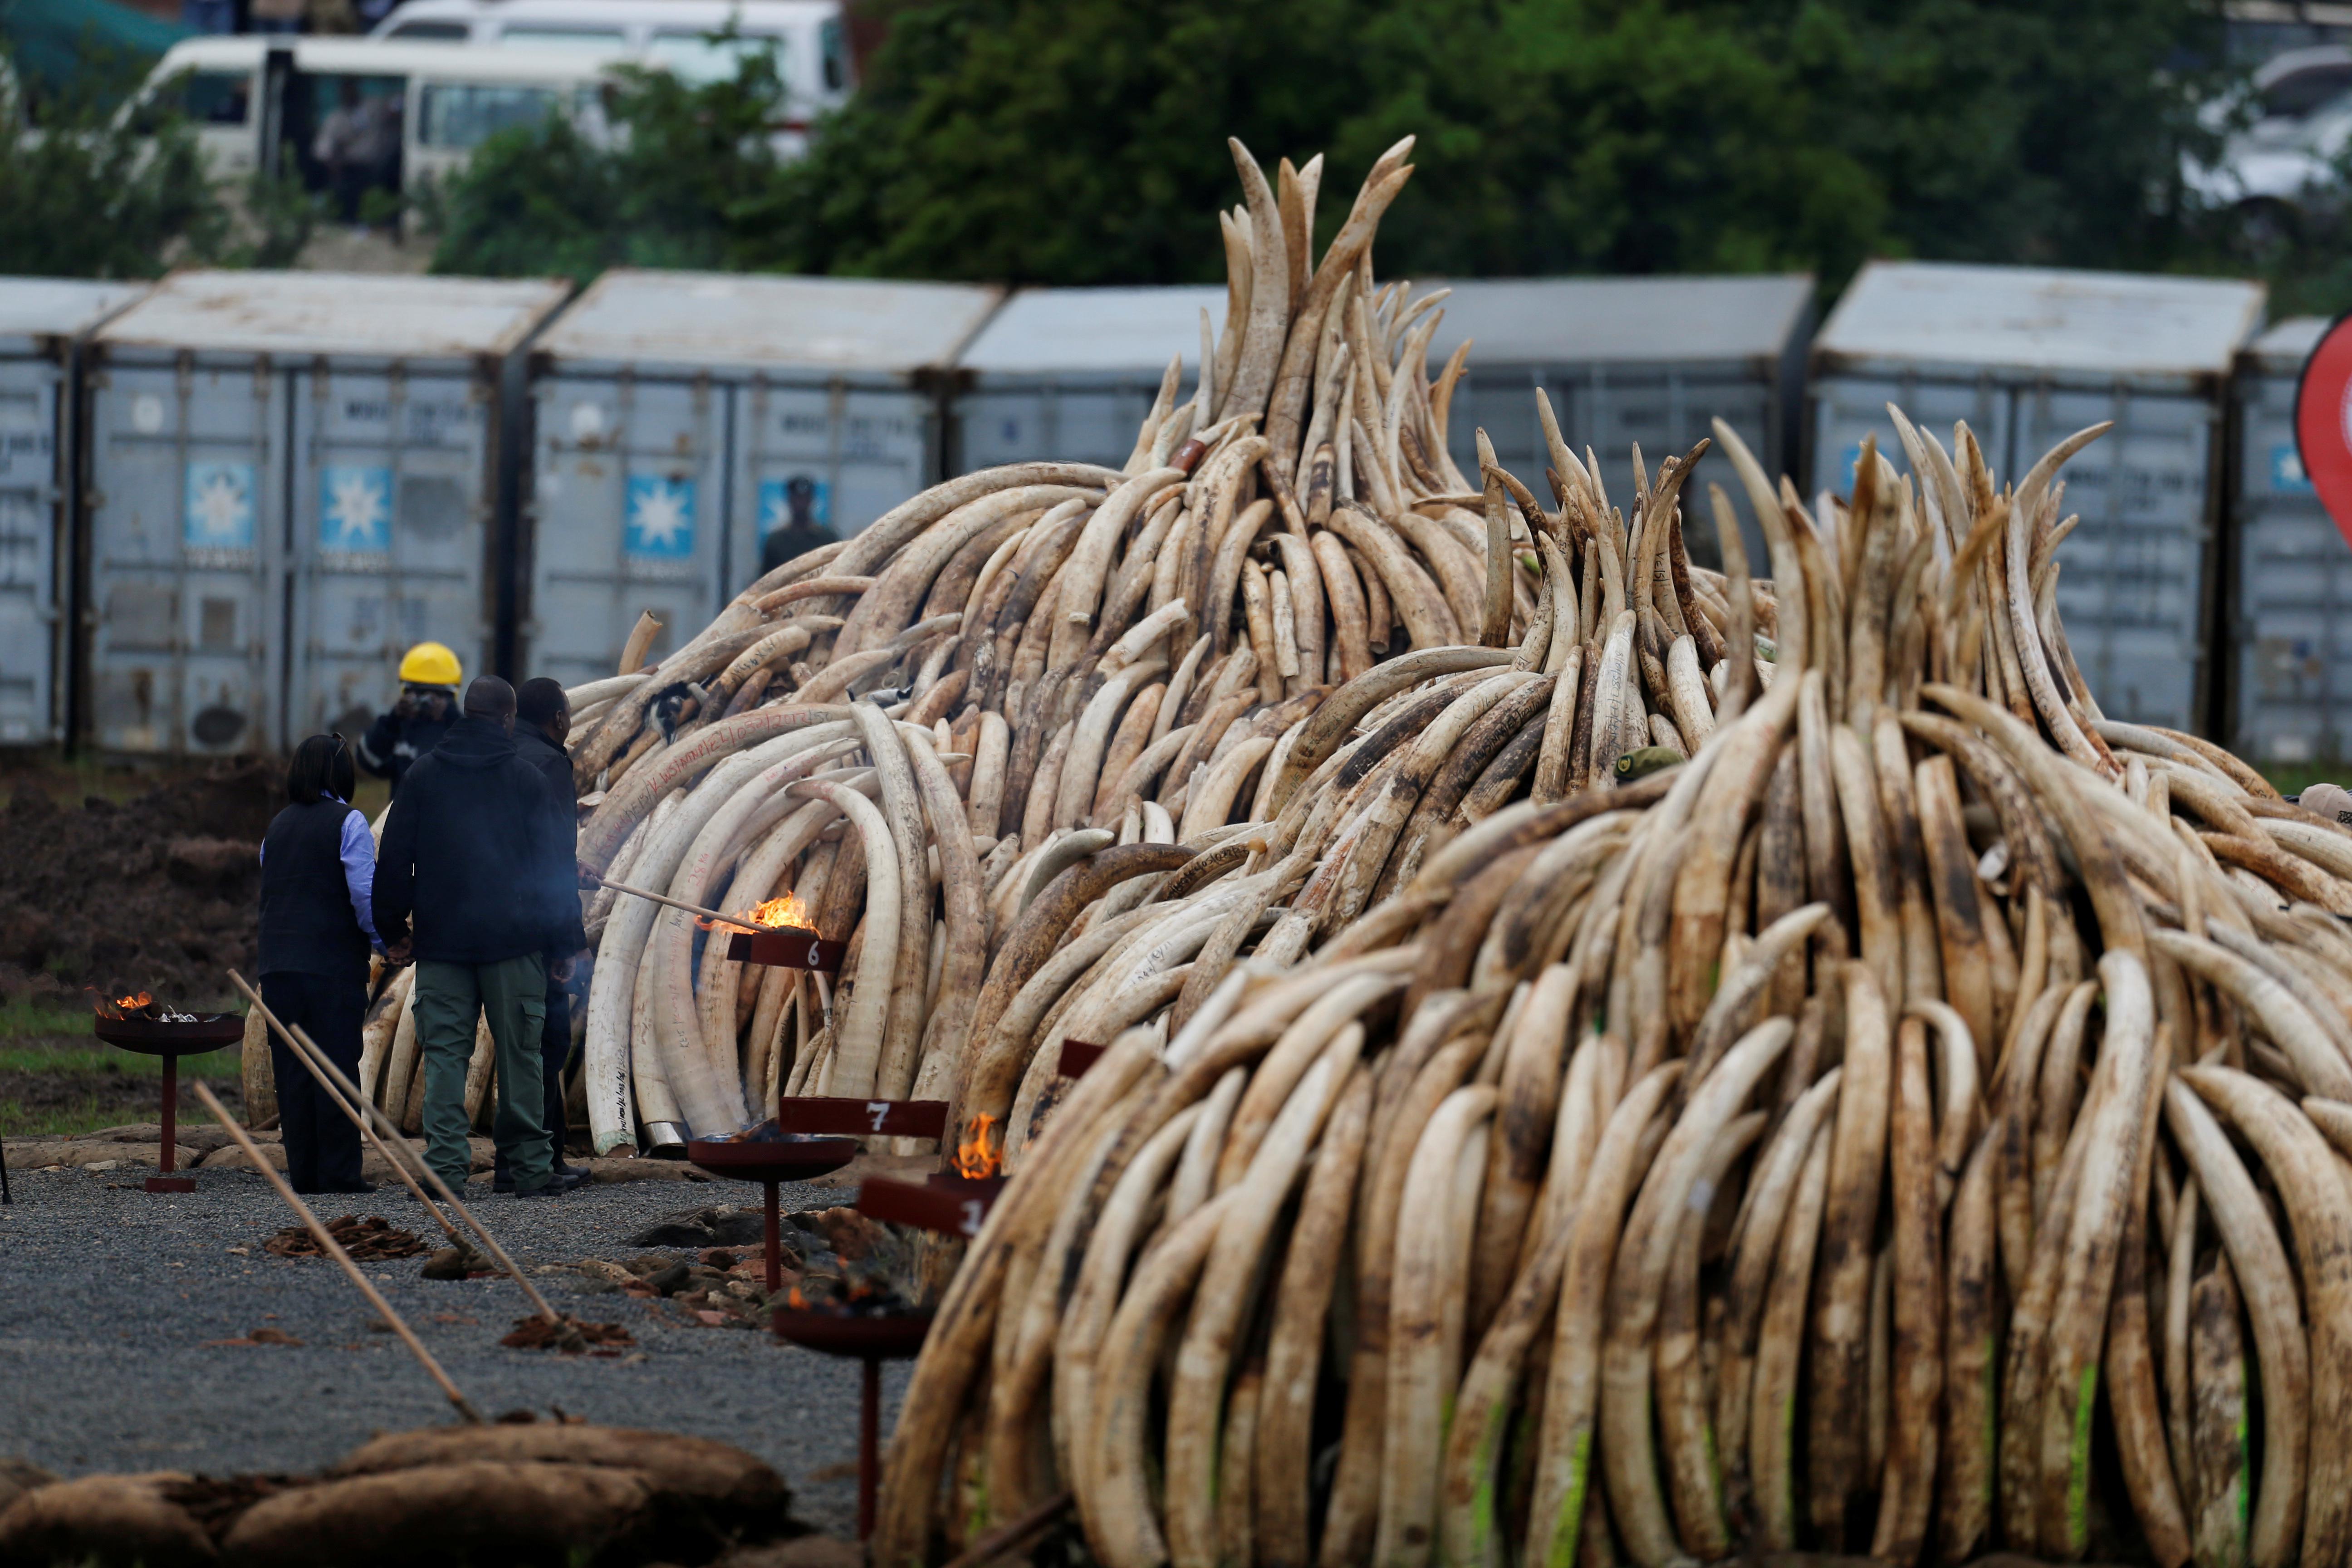 Kenya's President Uhuru Kenyatta lights elephant tusks, part of an estimated 105 tonnes of confiscated ivory from smugglers and poachers, on fire at Nairobi National Park near Nairobi, Kenya, April 30, 2016. REUTERS/Thomas Mukoya - RTX2C8K6